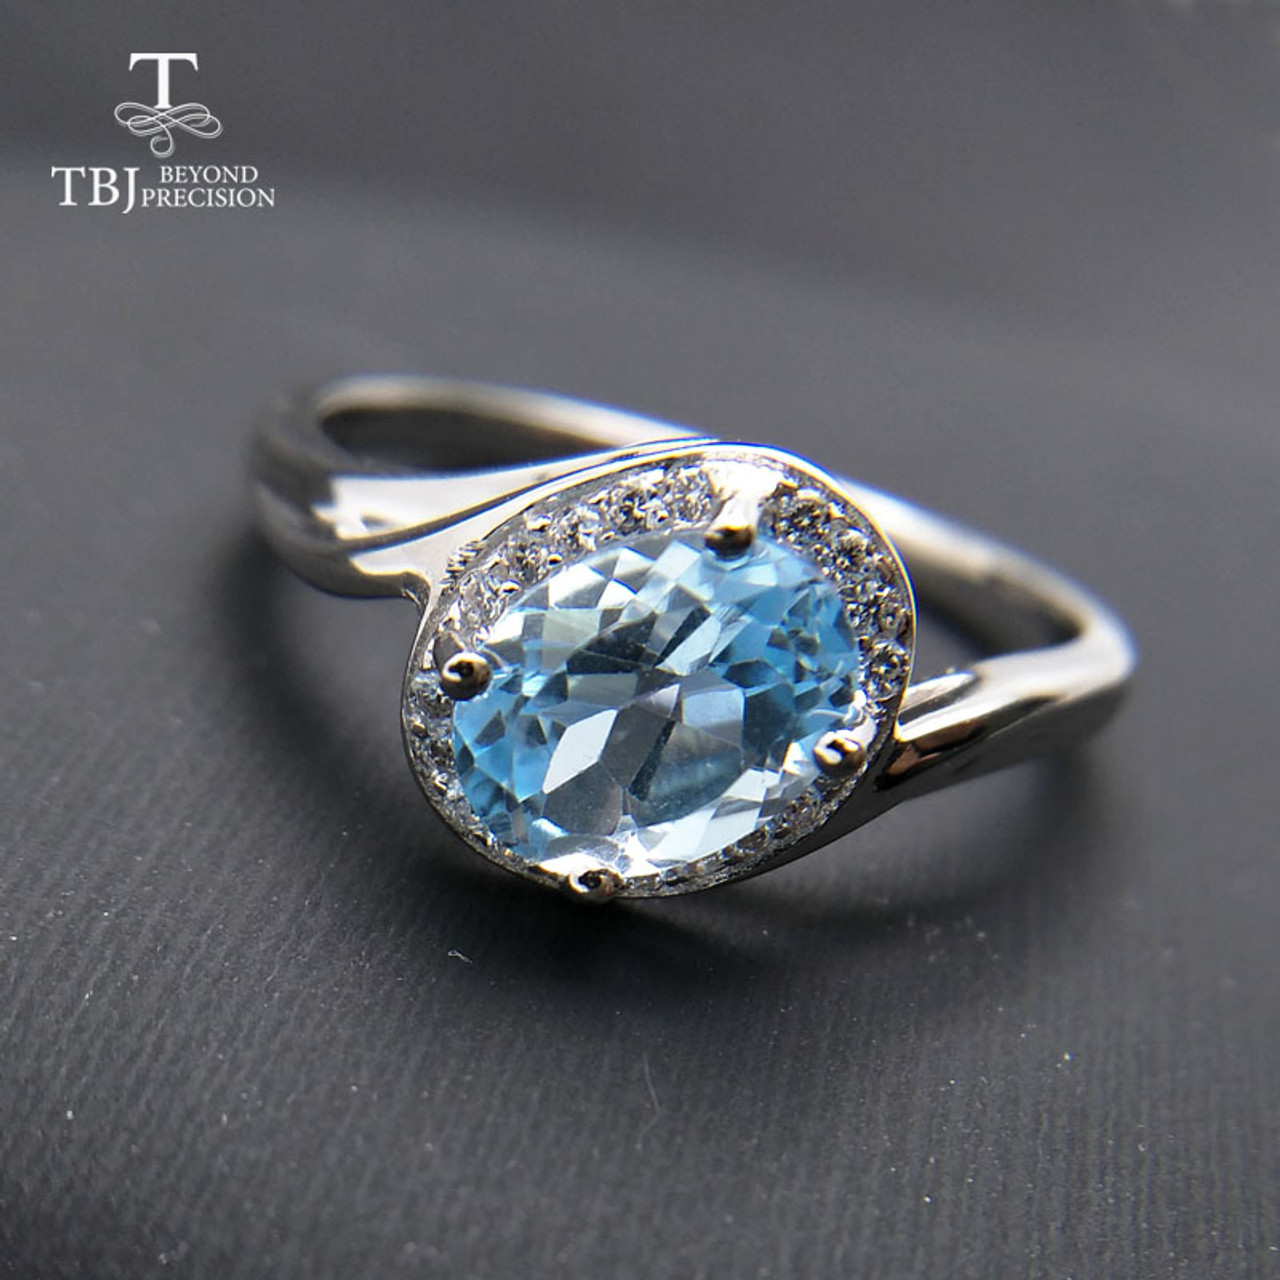 Natural Topaz Gem 2ct Crystal Solid 925 Sterling Silver Engagement for Women